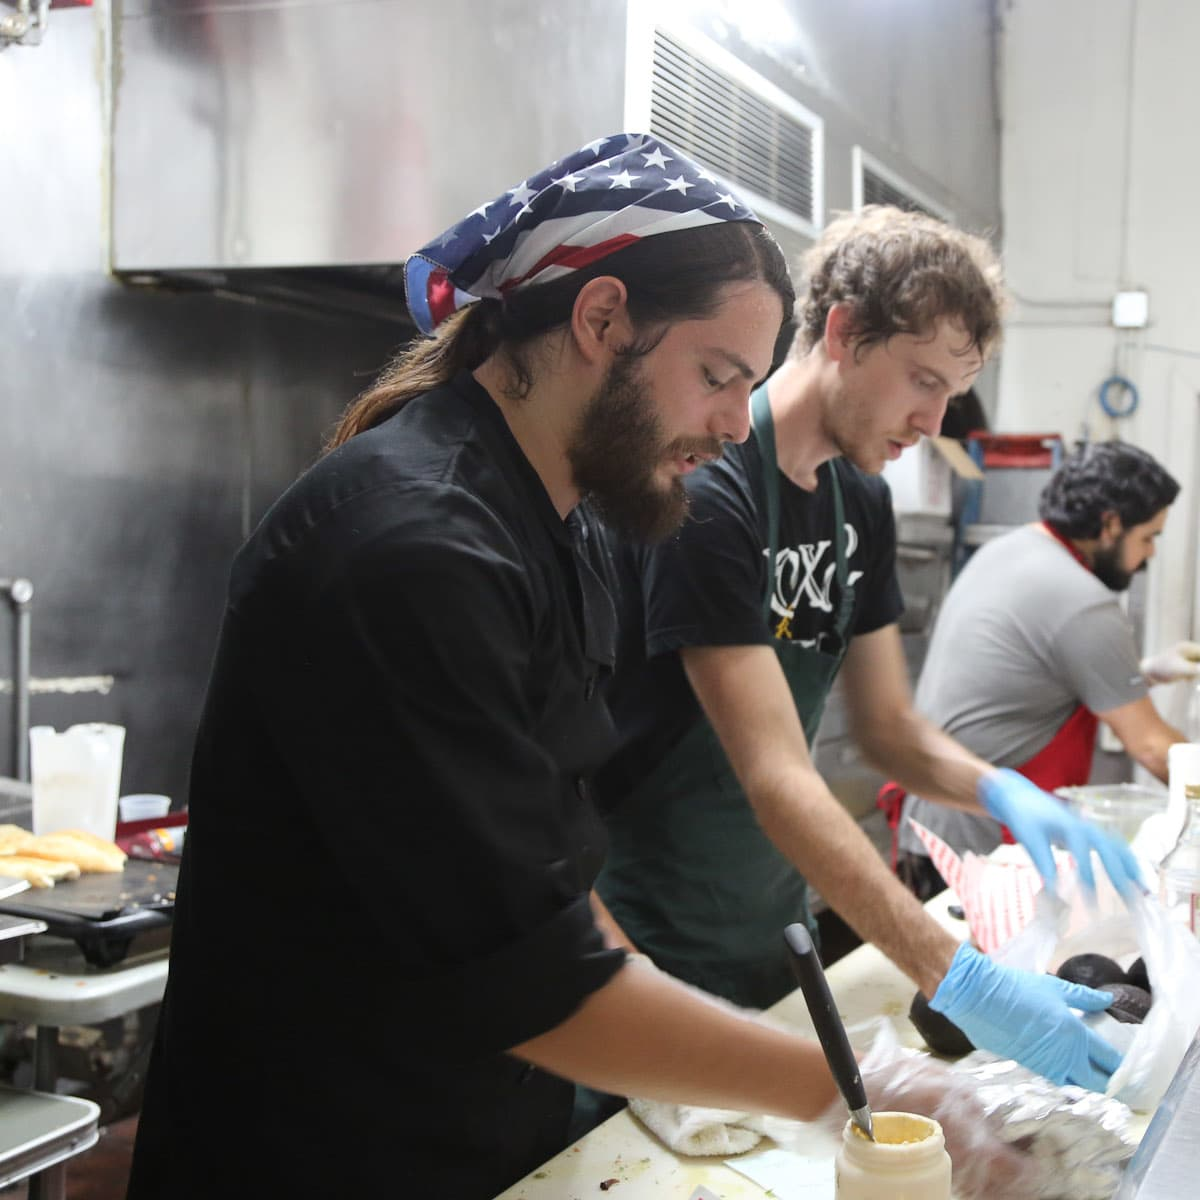 Brave Kitchen Project's first pop-up dinner June 2013 chefs in kitchen